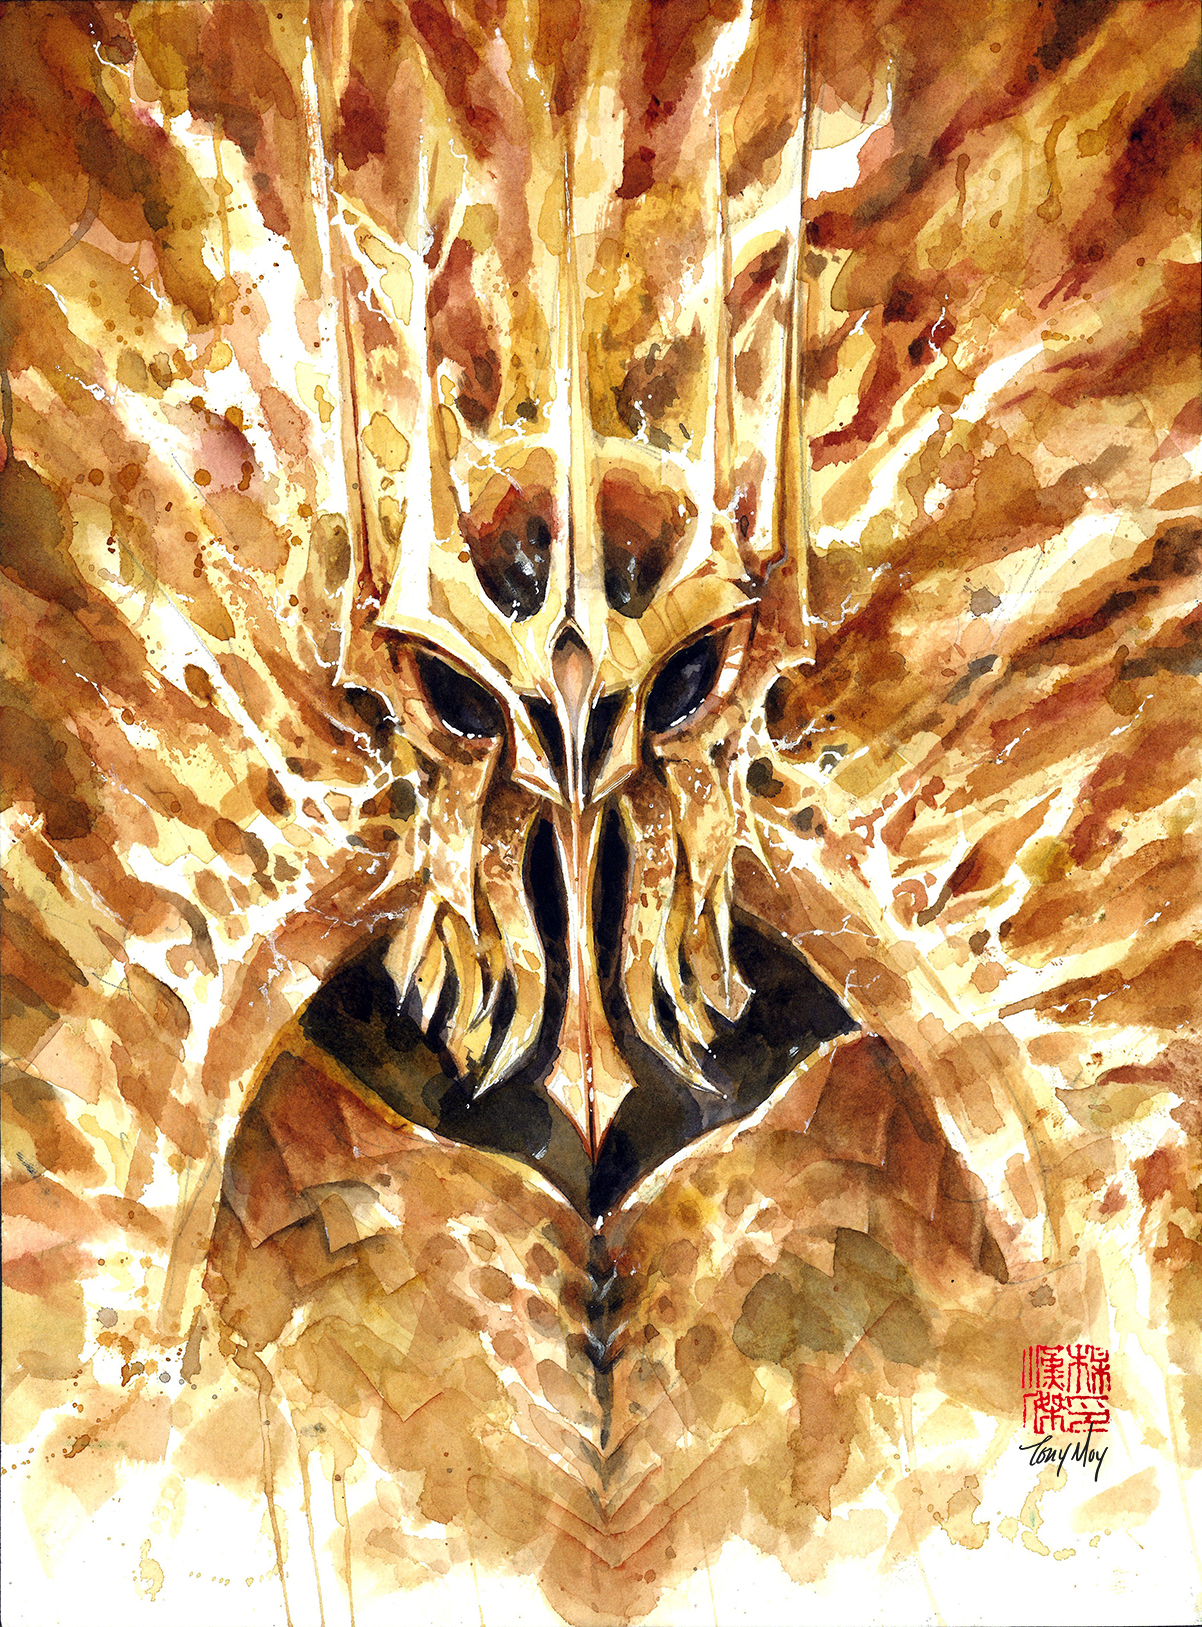 Sauron LOTR